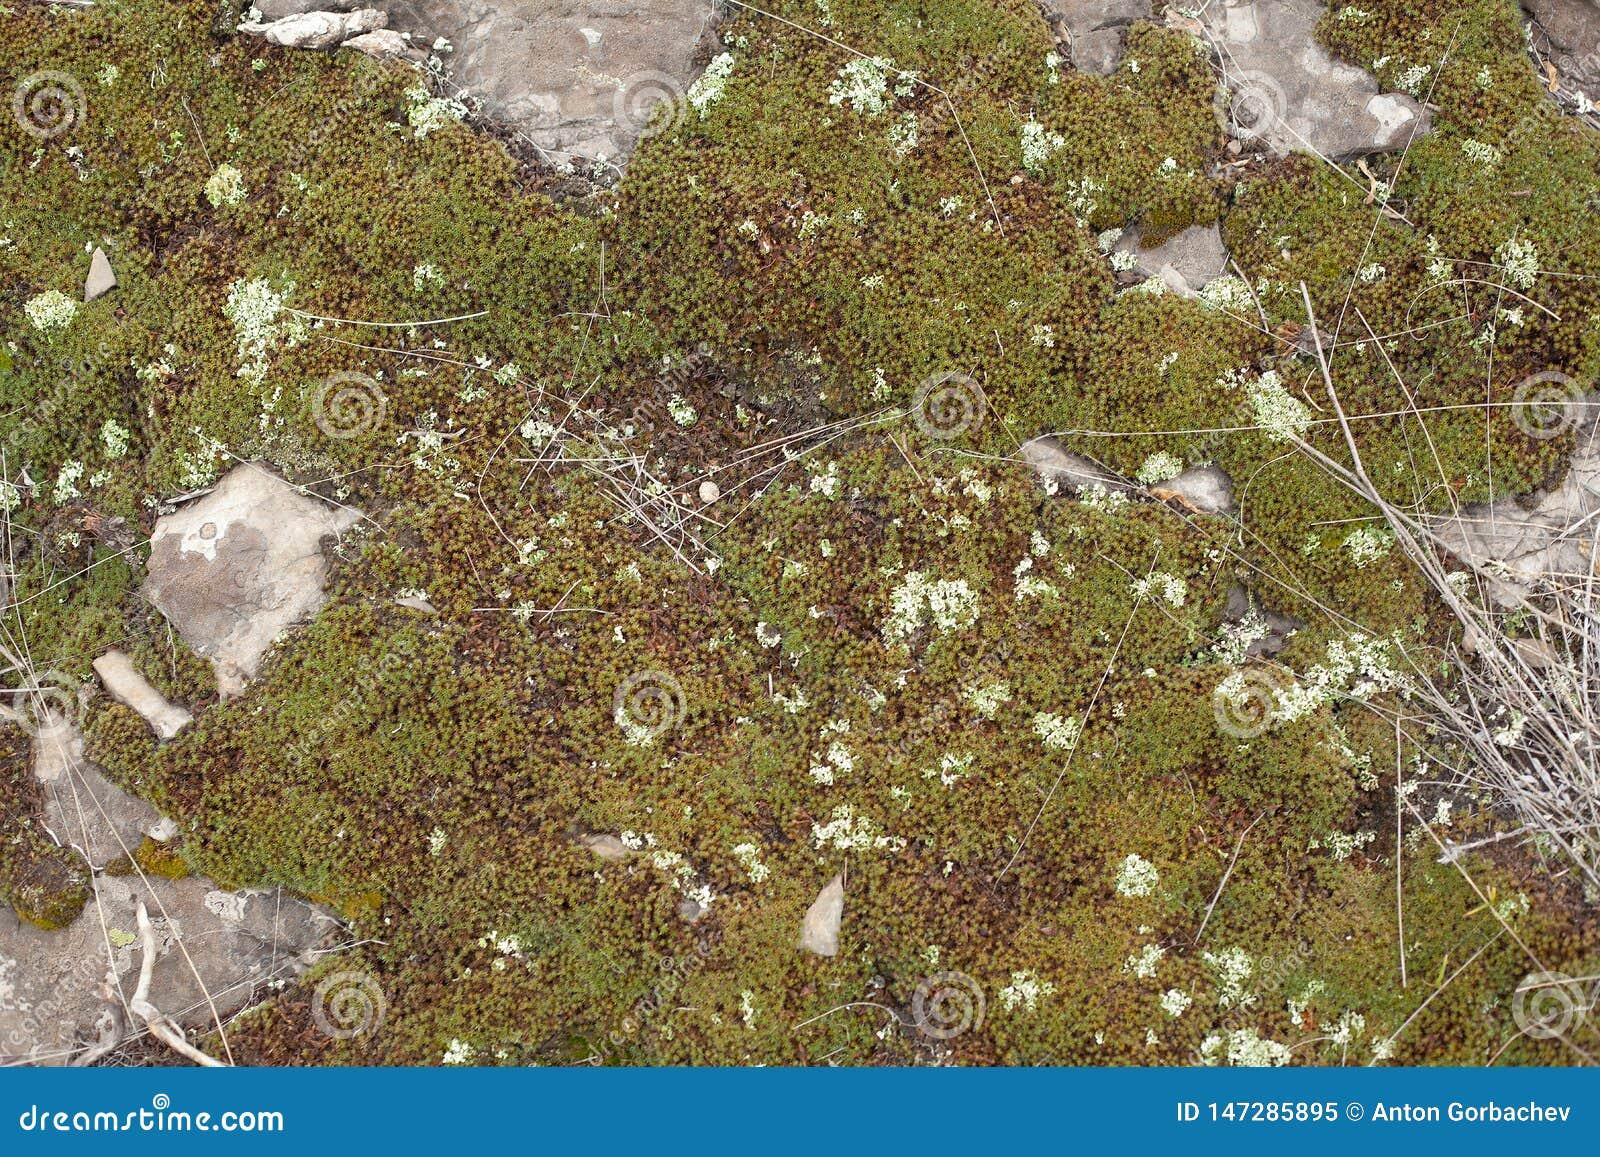 Rocky ground with moss